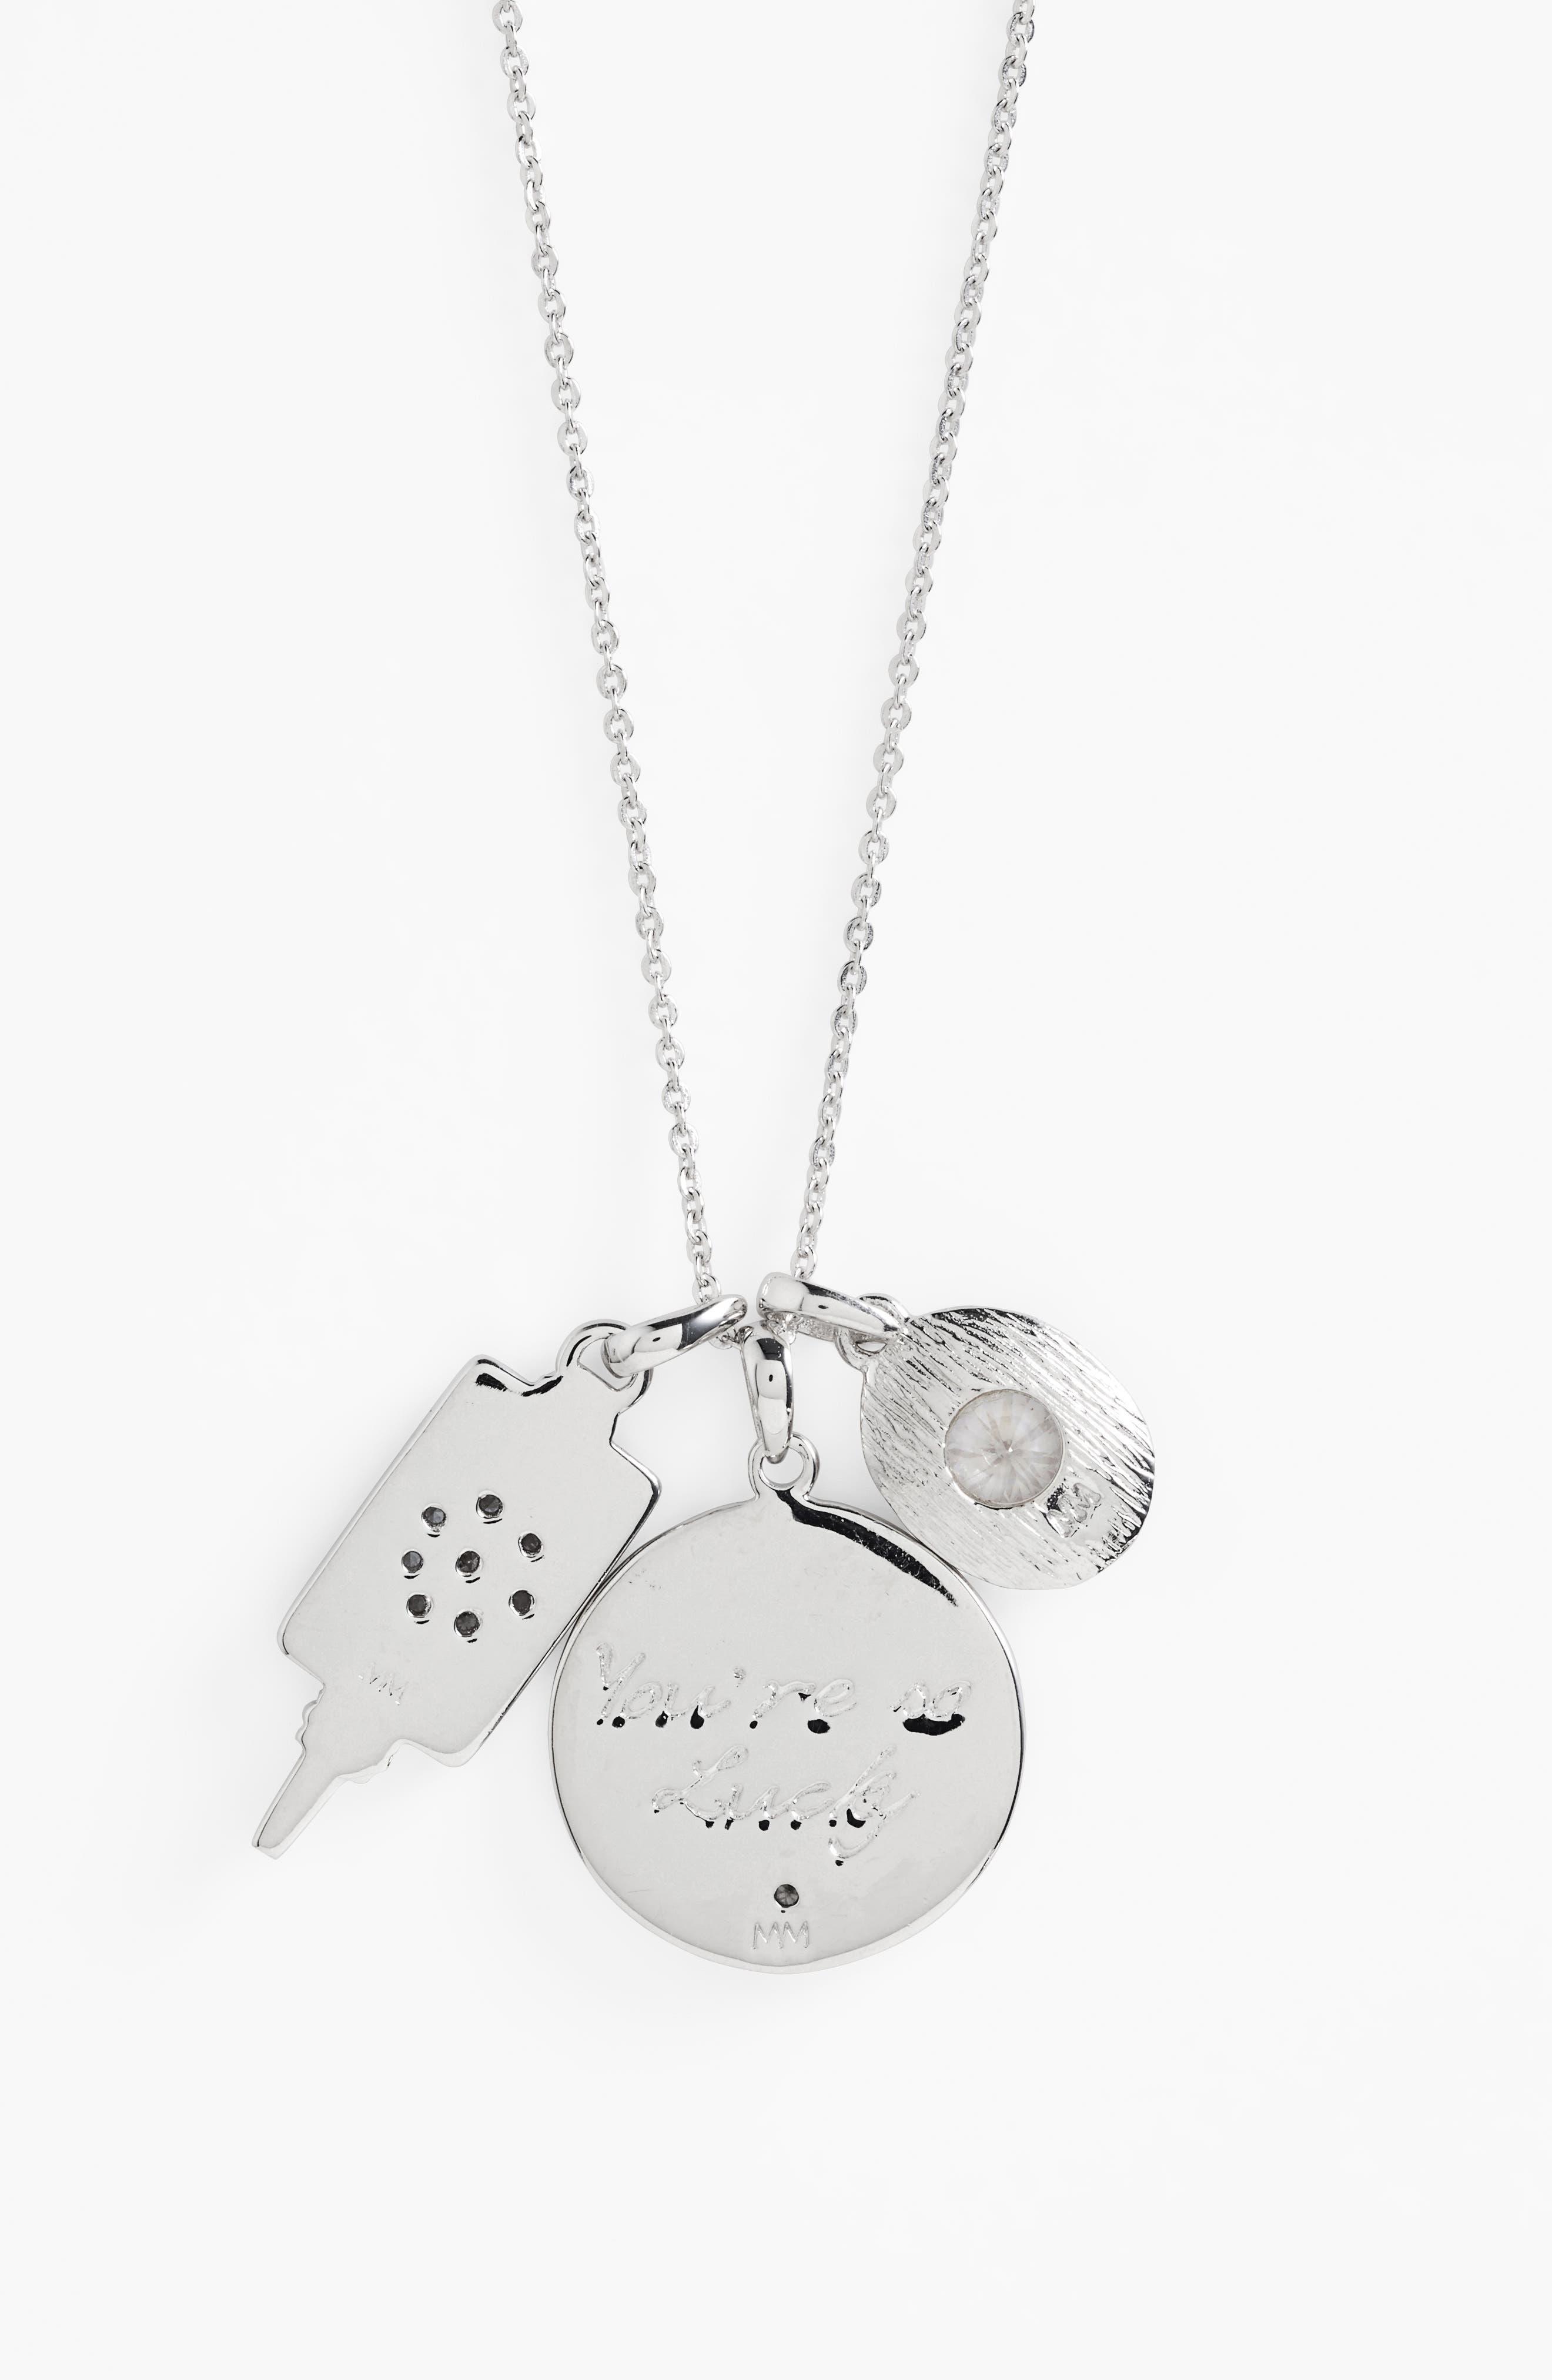 Goddess of Good Fortune Cluster Pendant Necklace,                             Alternate thumbnail 2, color,                             040